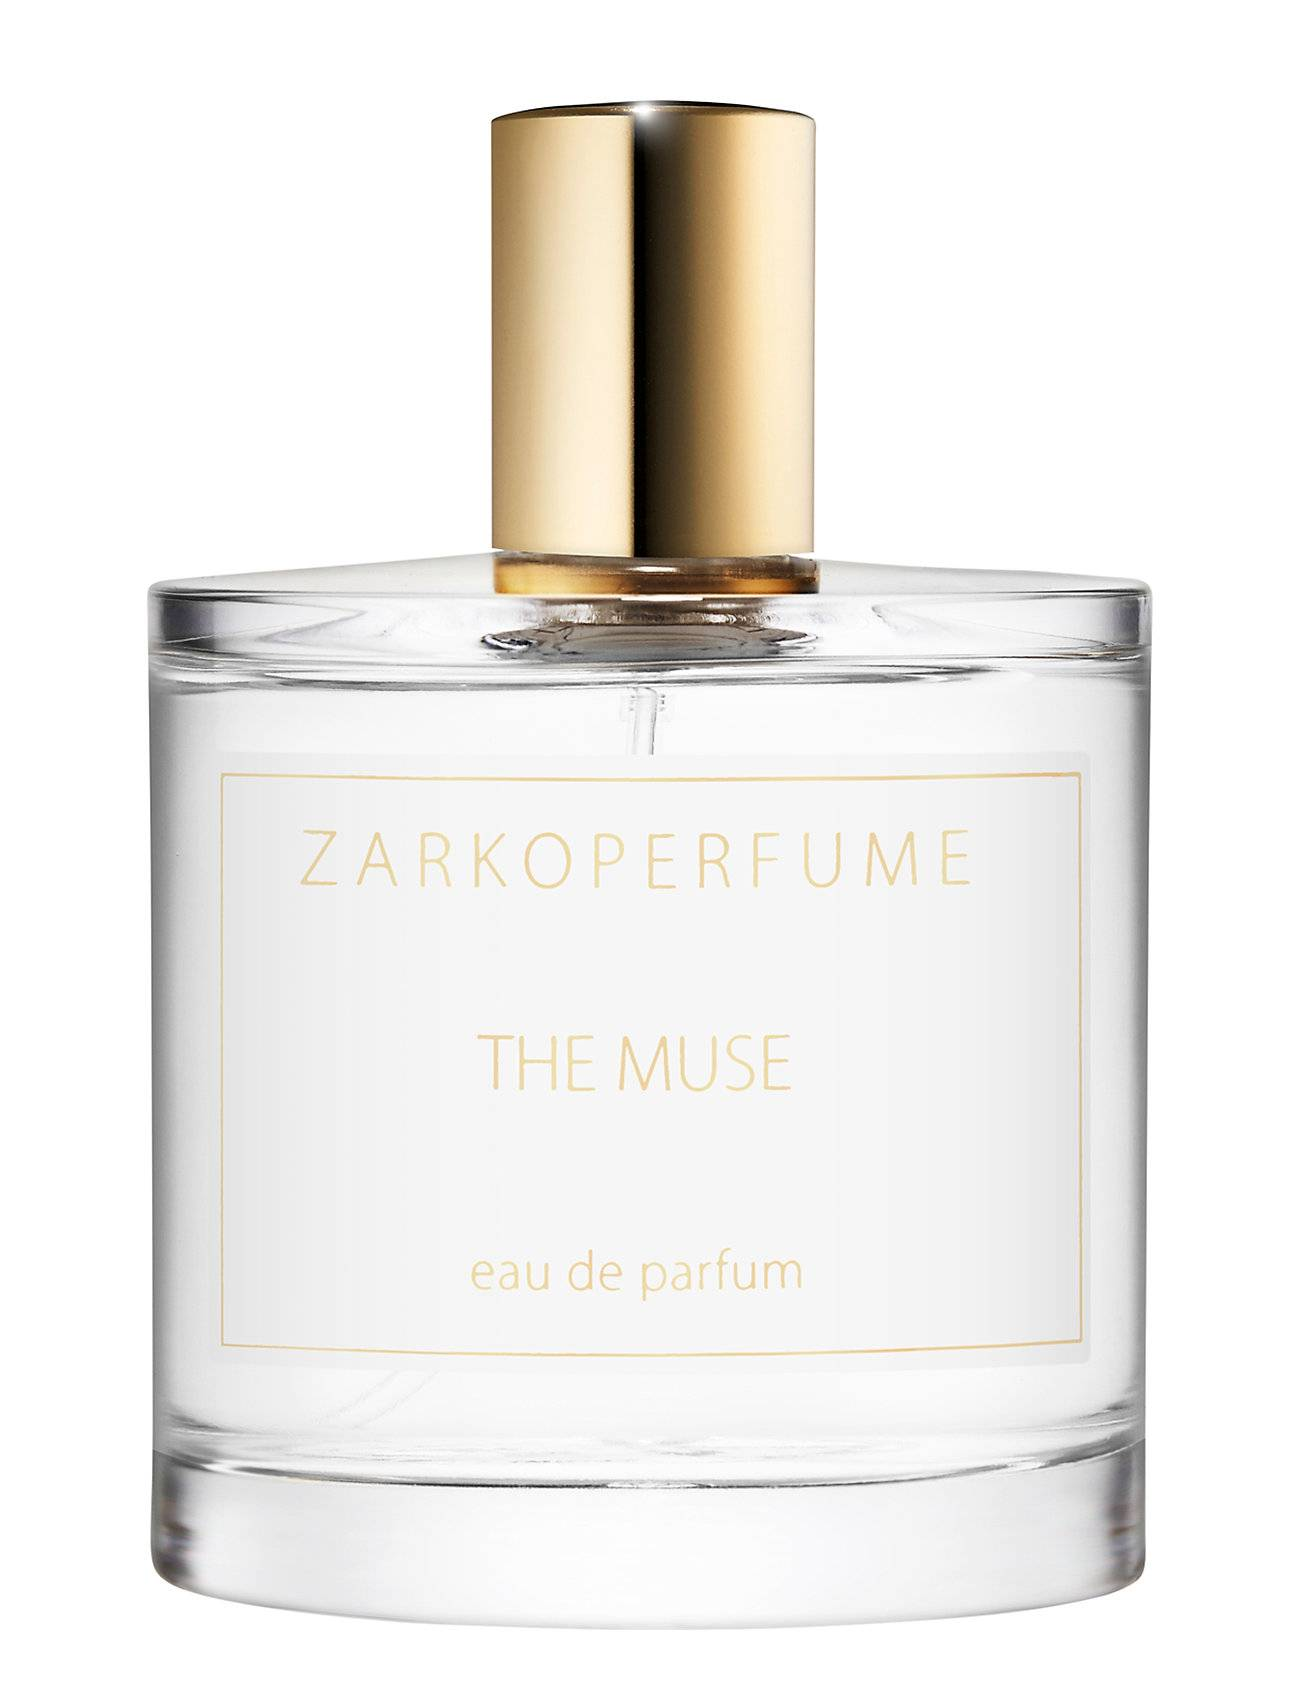 Zarkoperfume The Muse Edp Hajuvesi Eau De Parfum Nude Zarkoperfume